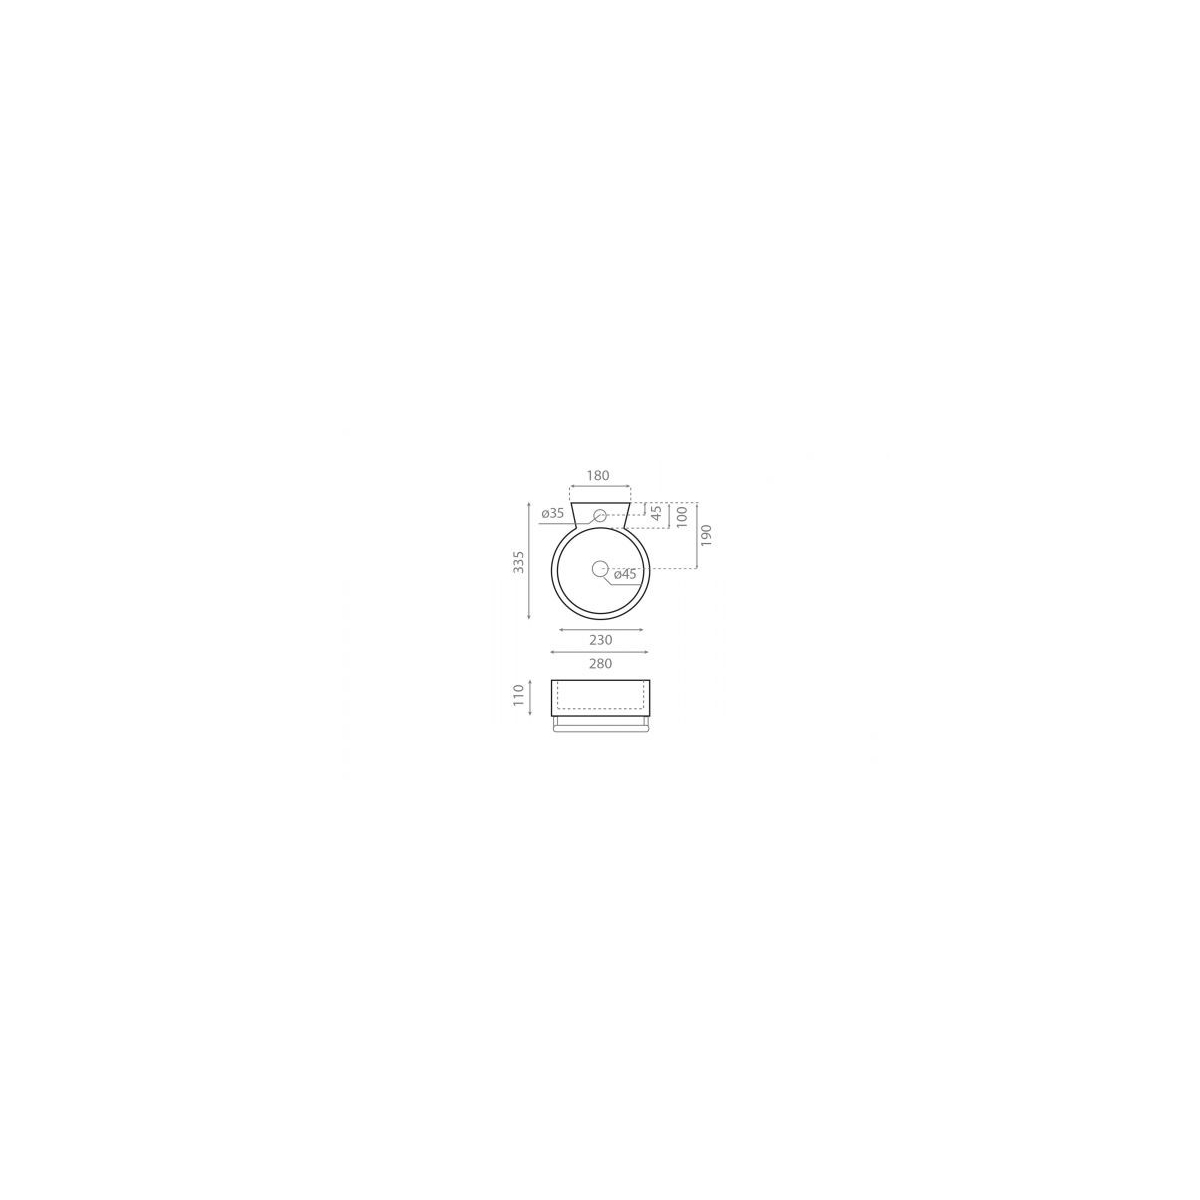 Lavabo Mini Sherry - Lavabos mini - Marca The Bathco